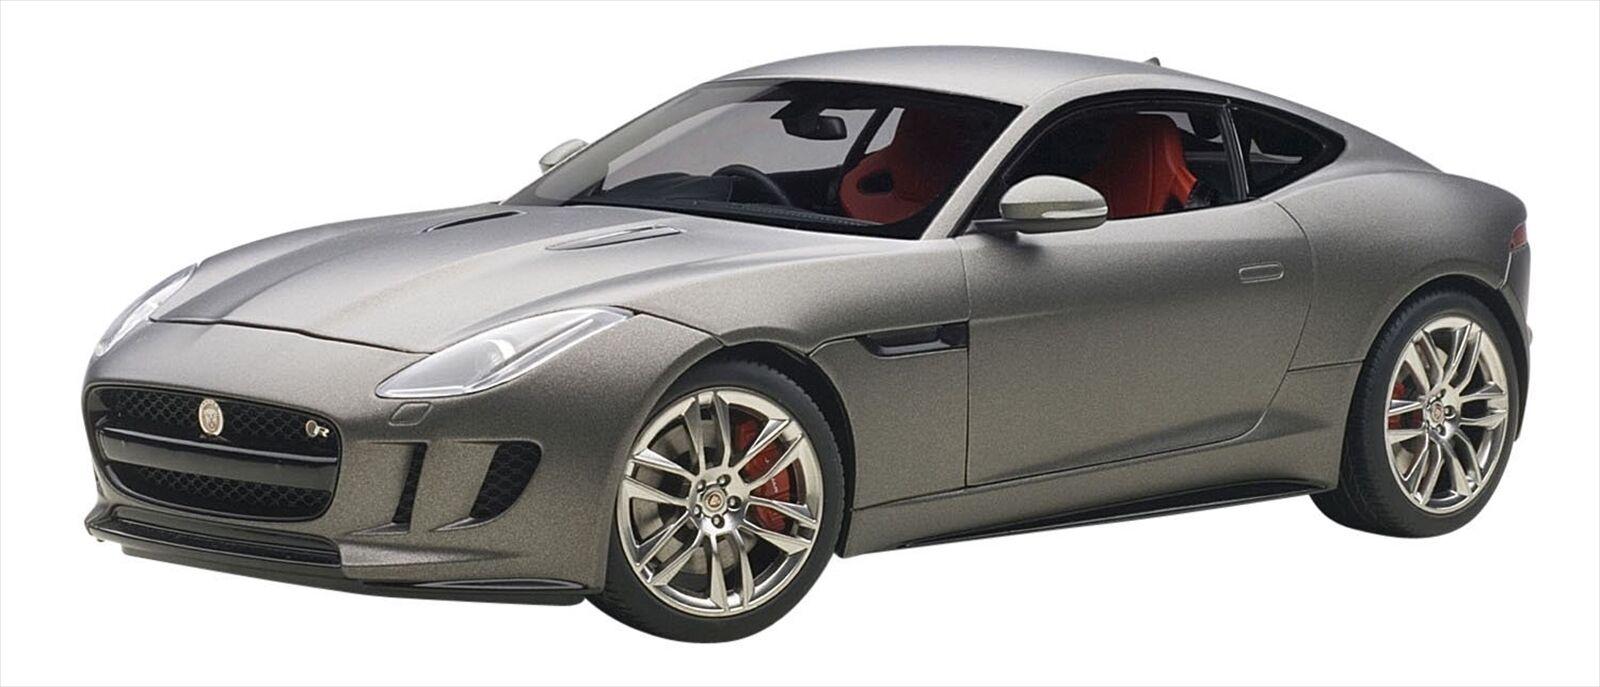 AUTOart 1 18 Jaguar F-Type R Coupe 2015 Matt gris Diecast Model 73654